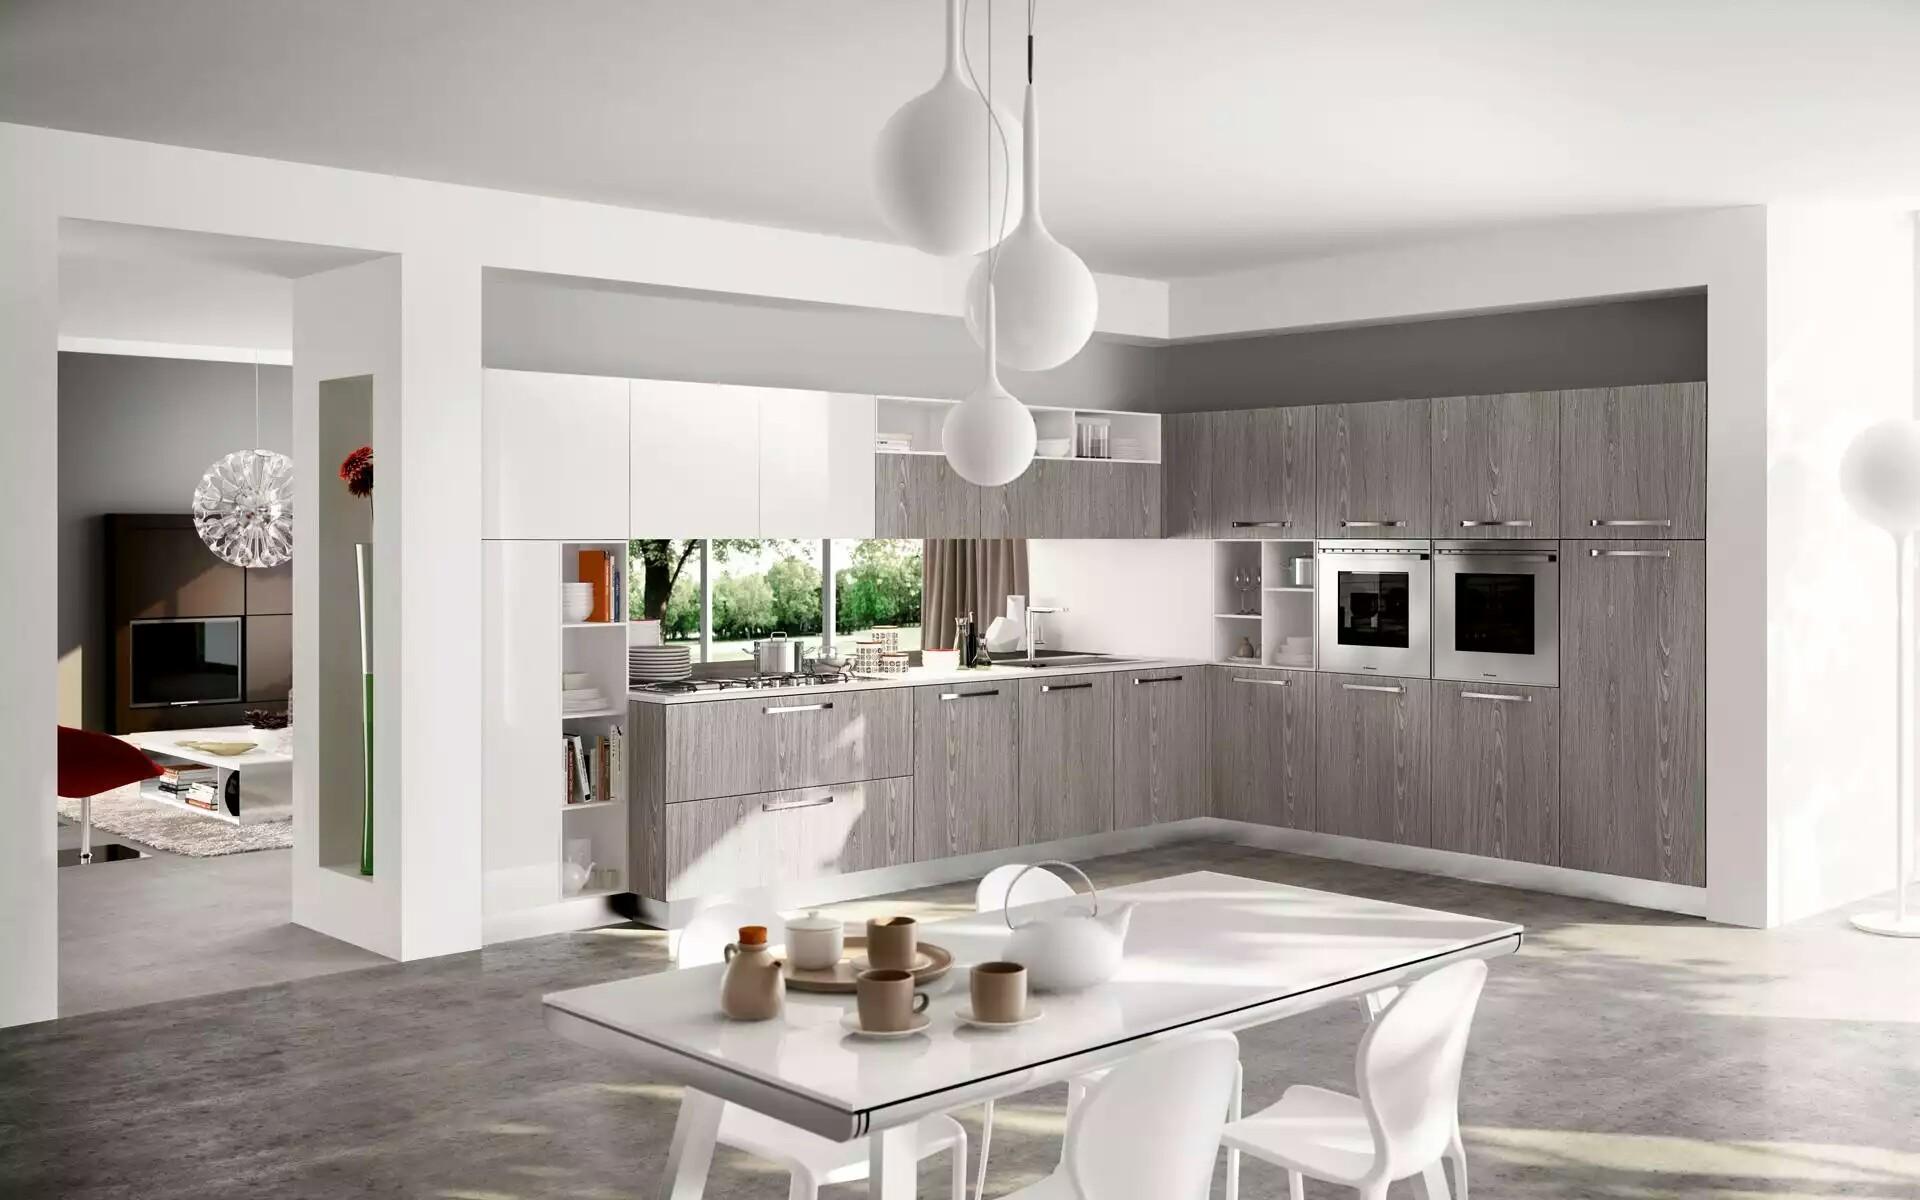 Bright and Sunny Kitchen Design ideas  My Decorative